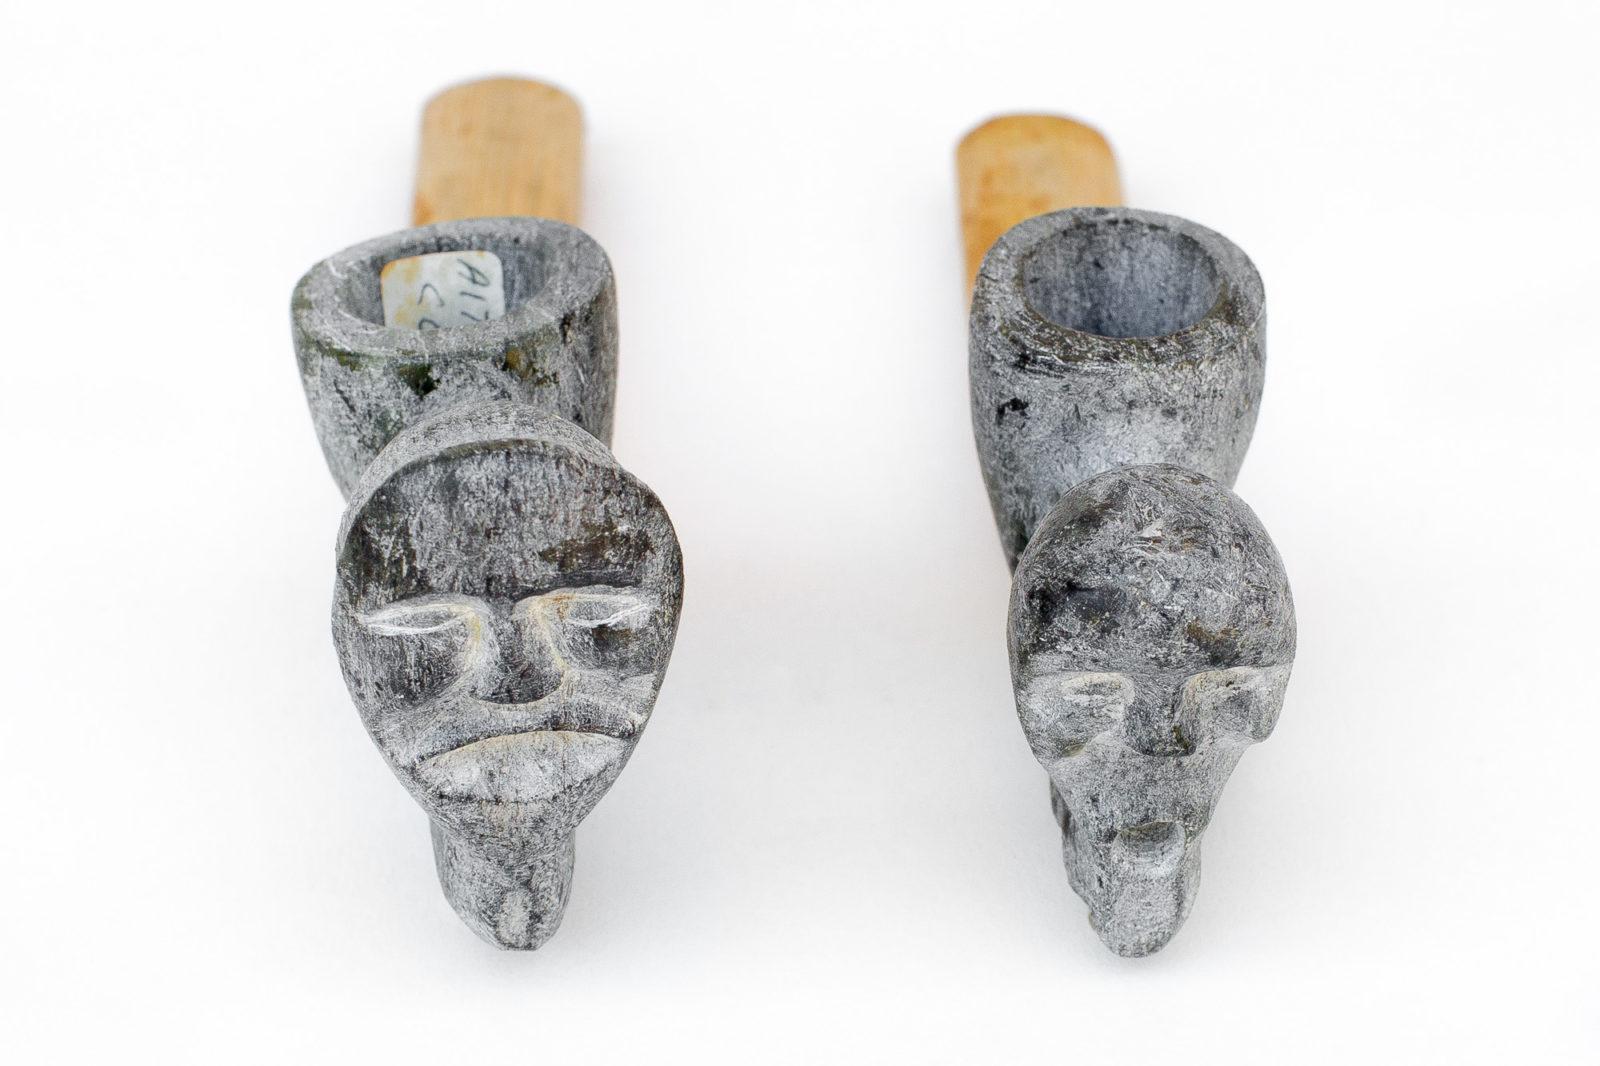 Silas Aittauq - untitled (pipes)